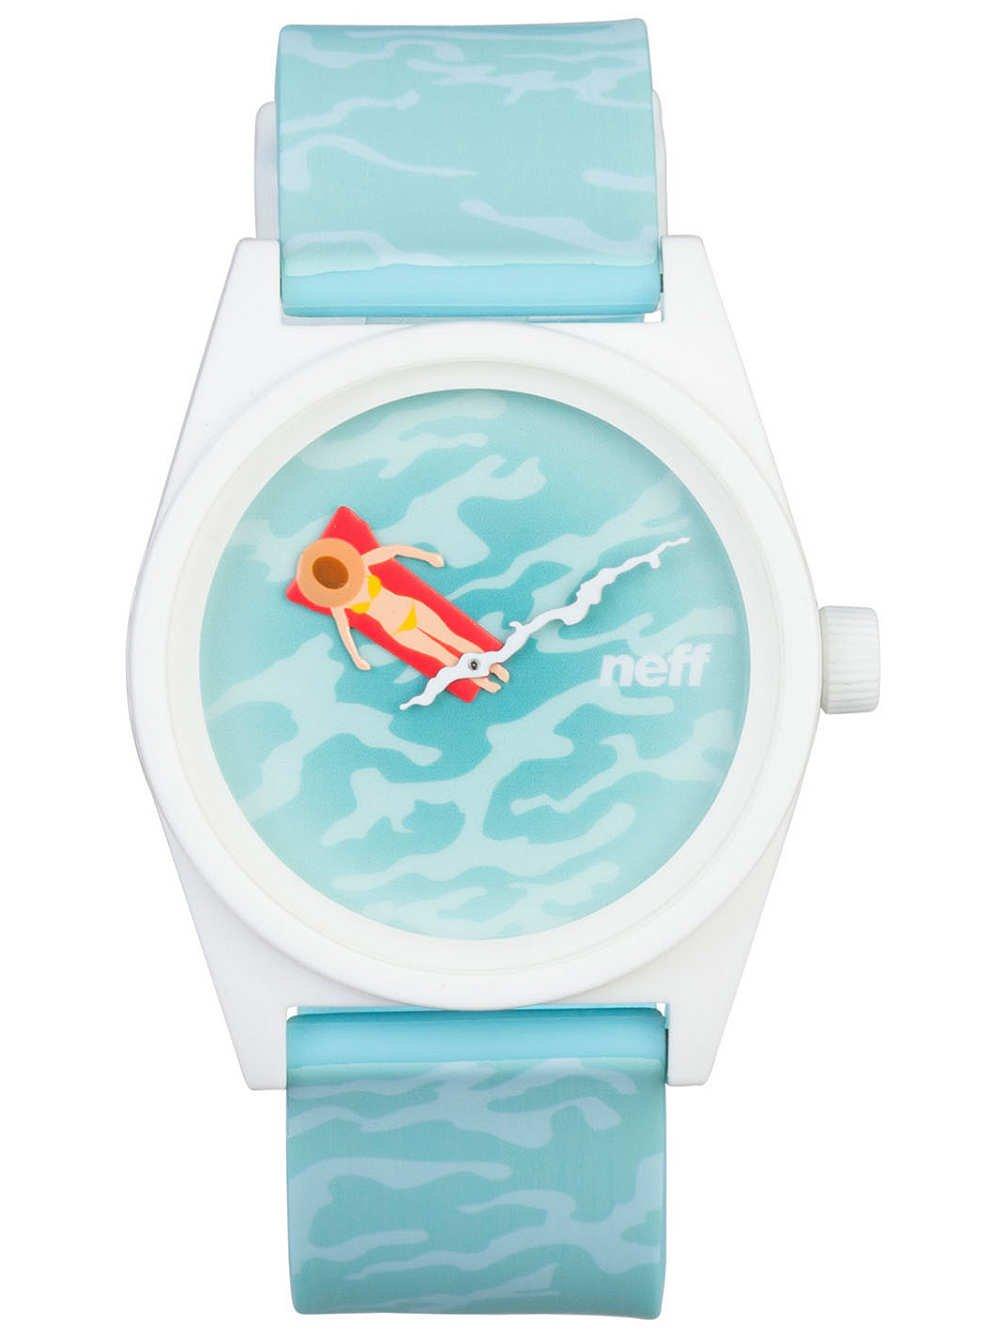 Neff Daily Wild Men's Designer Watch - Raft/One Size Fits All